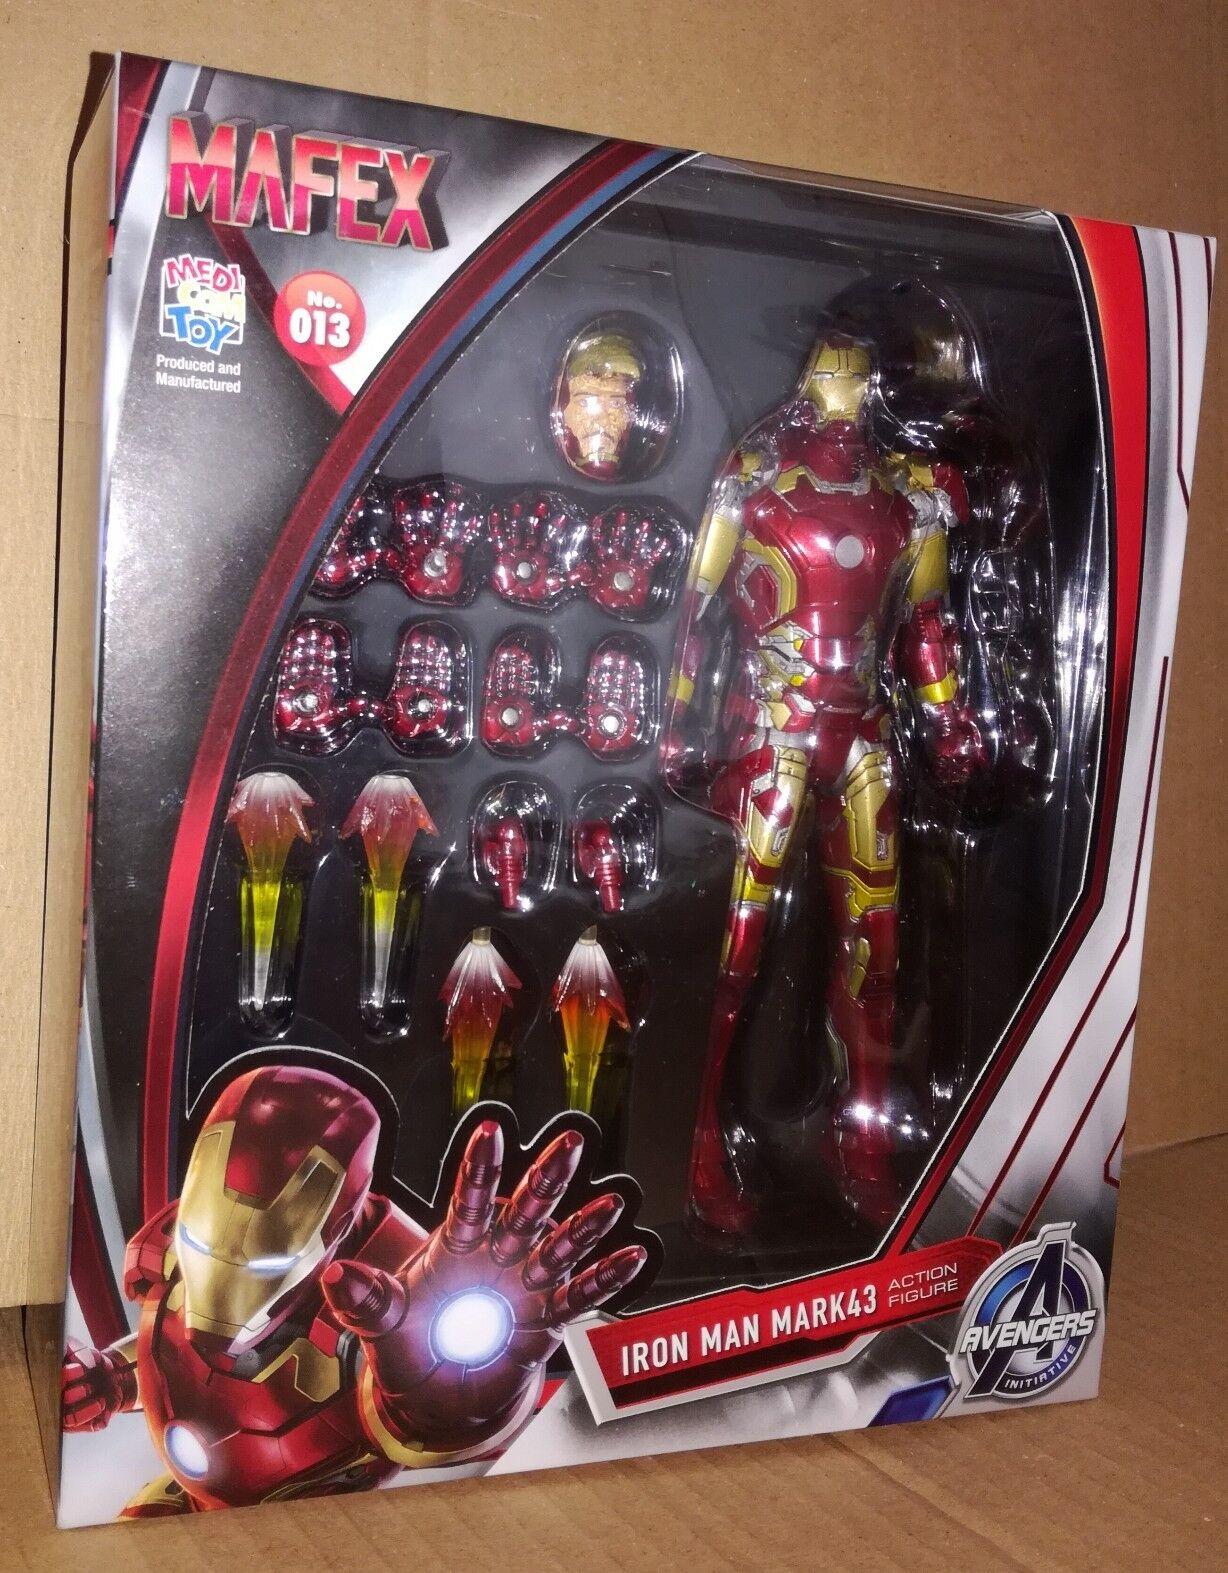 Medicom Mafex 013 Iron Man Mark 43 Marvel DC Comics